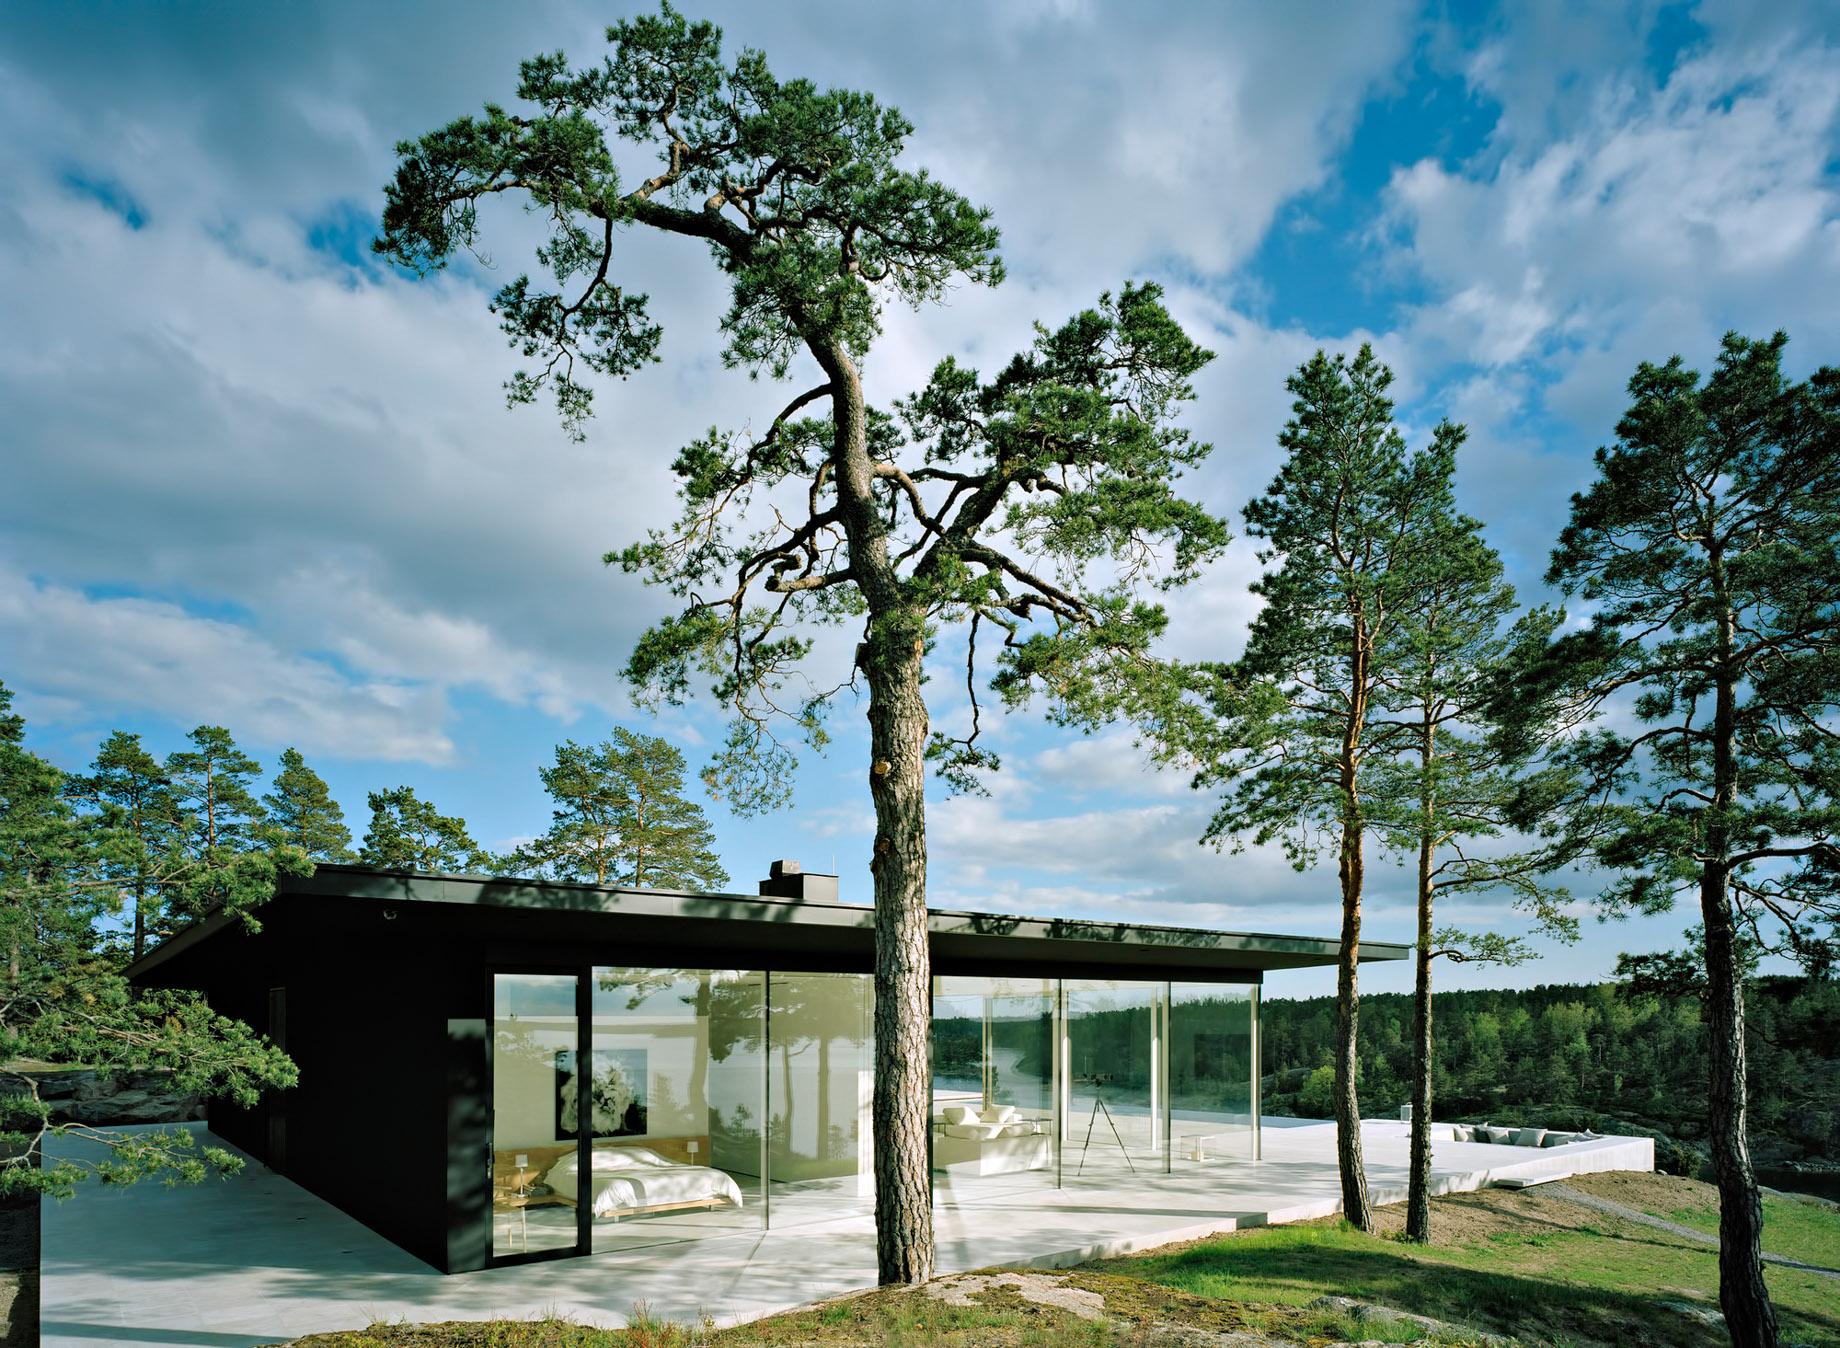 Villa Overby Luxury Residence - Värmdö, Stockholm, Sweden